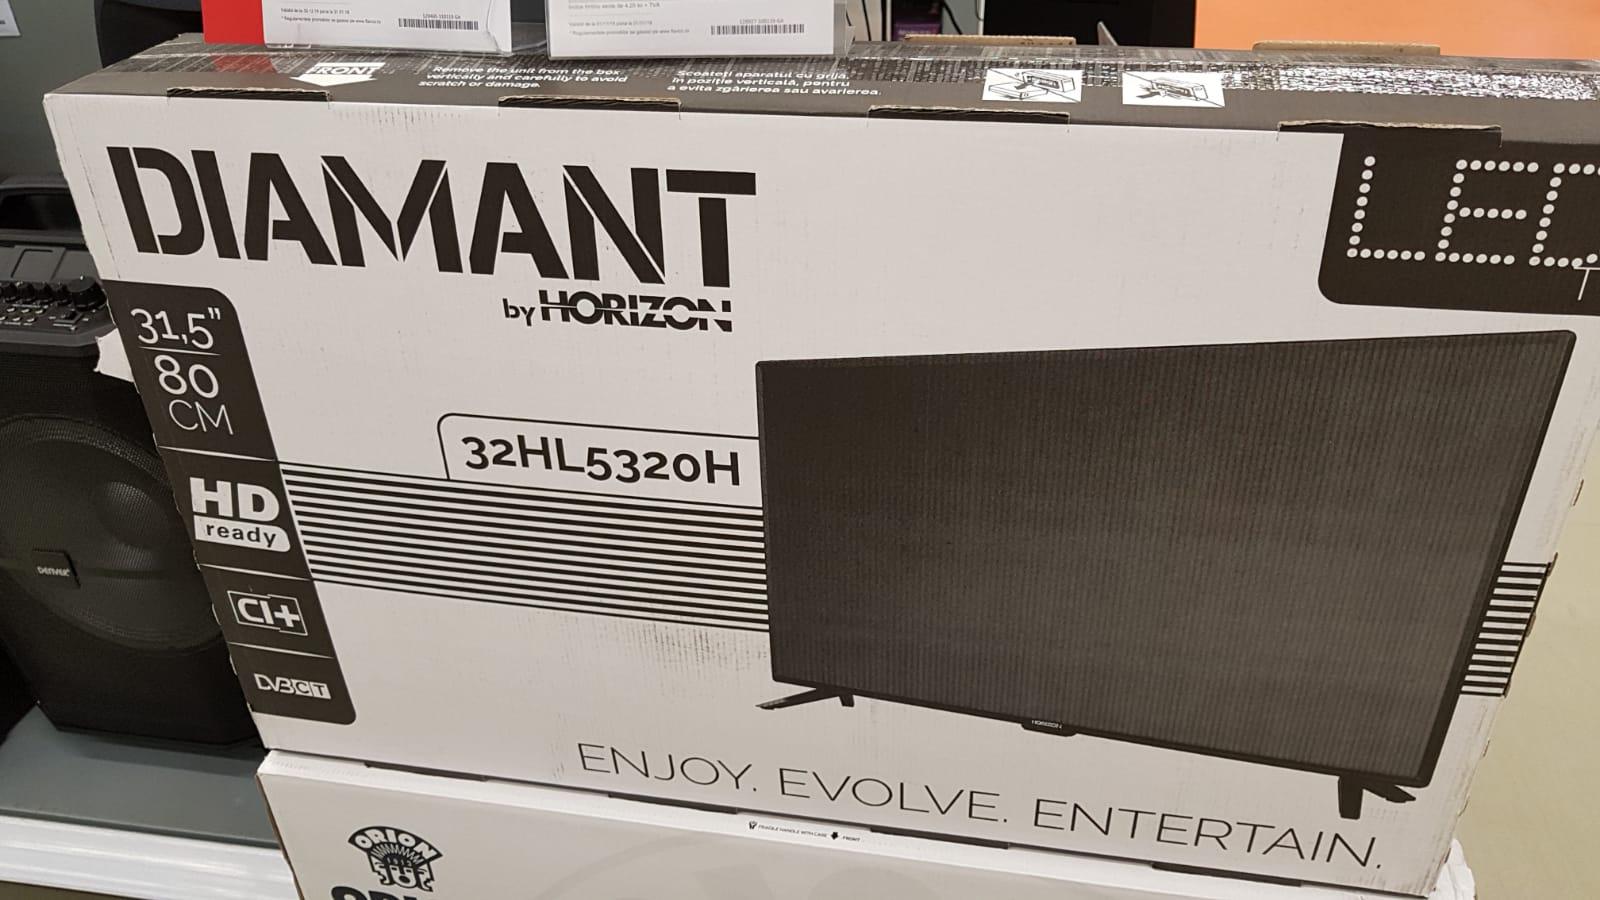 Televizoarele Diamant revin pe piață. Televizor Diamant by Horizon într-un magazin